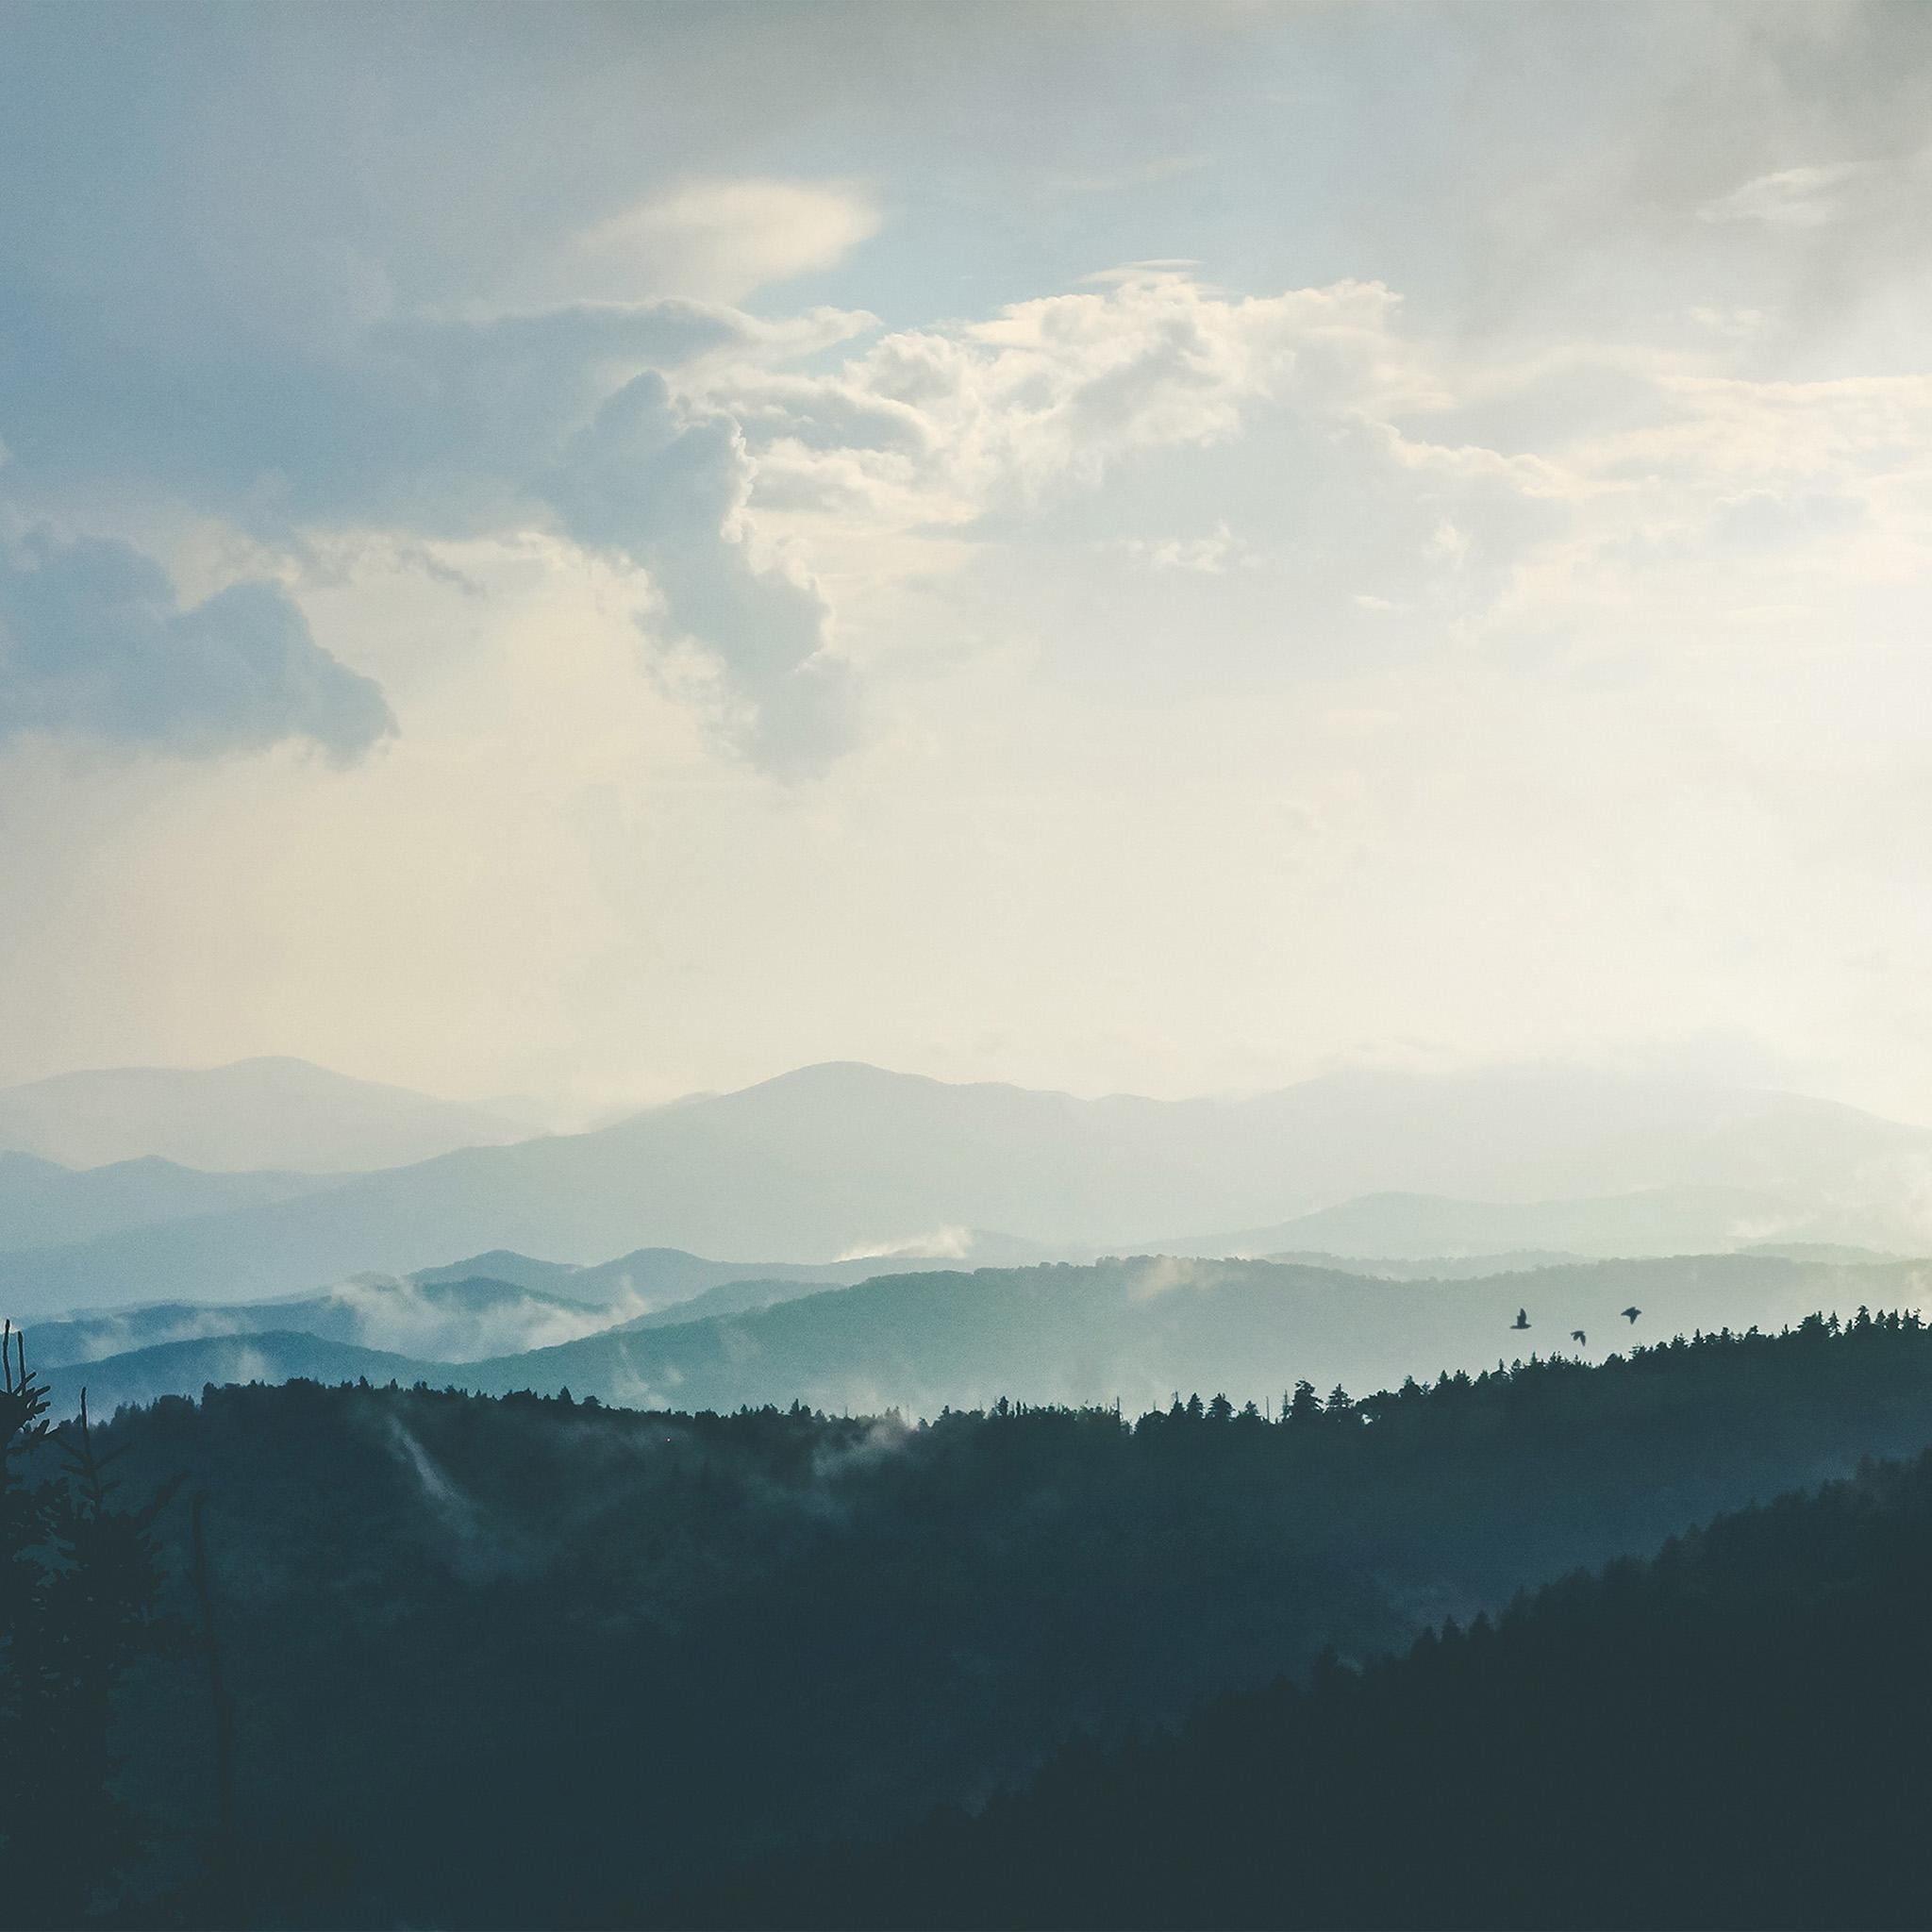 Anime Wallpaper For Macbook Air Nn56 Mountain Morning Sky Bird Blue Nature Wallpaper